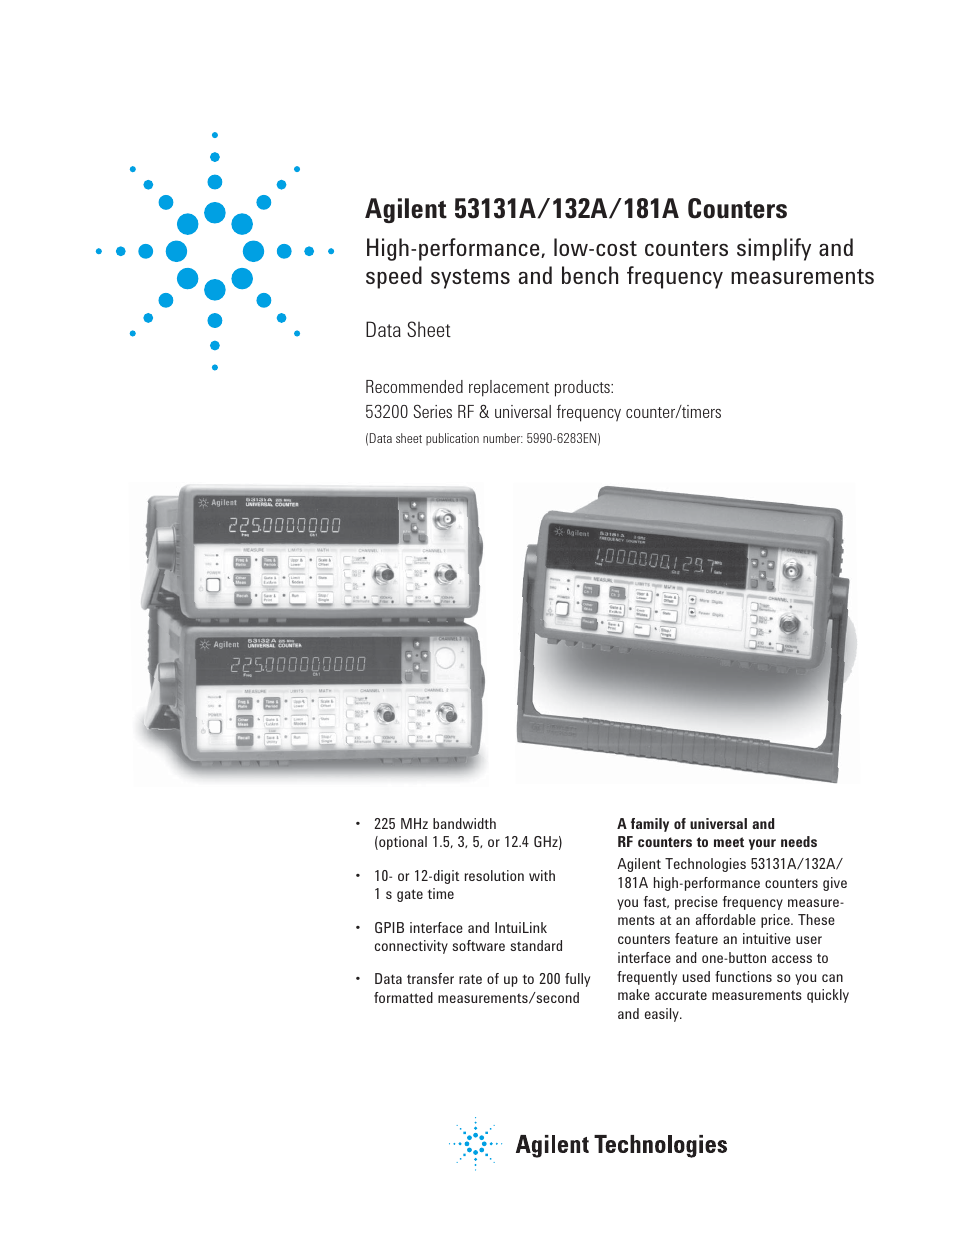 atec agilent 53132a 53131a 53181a user manual 13 pages rh manualsdir com hp/agilent 53132a manual agilent frequency counter 53132a manual